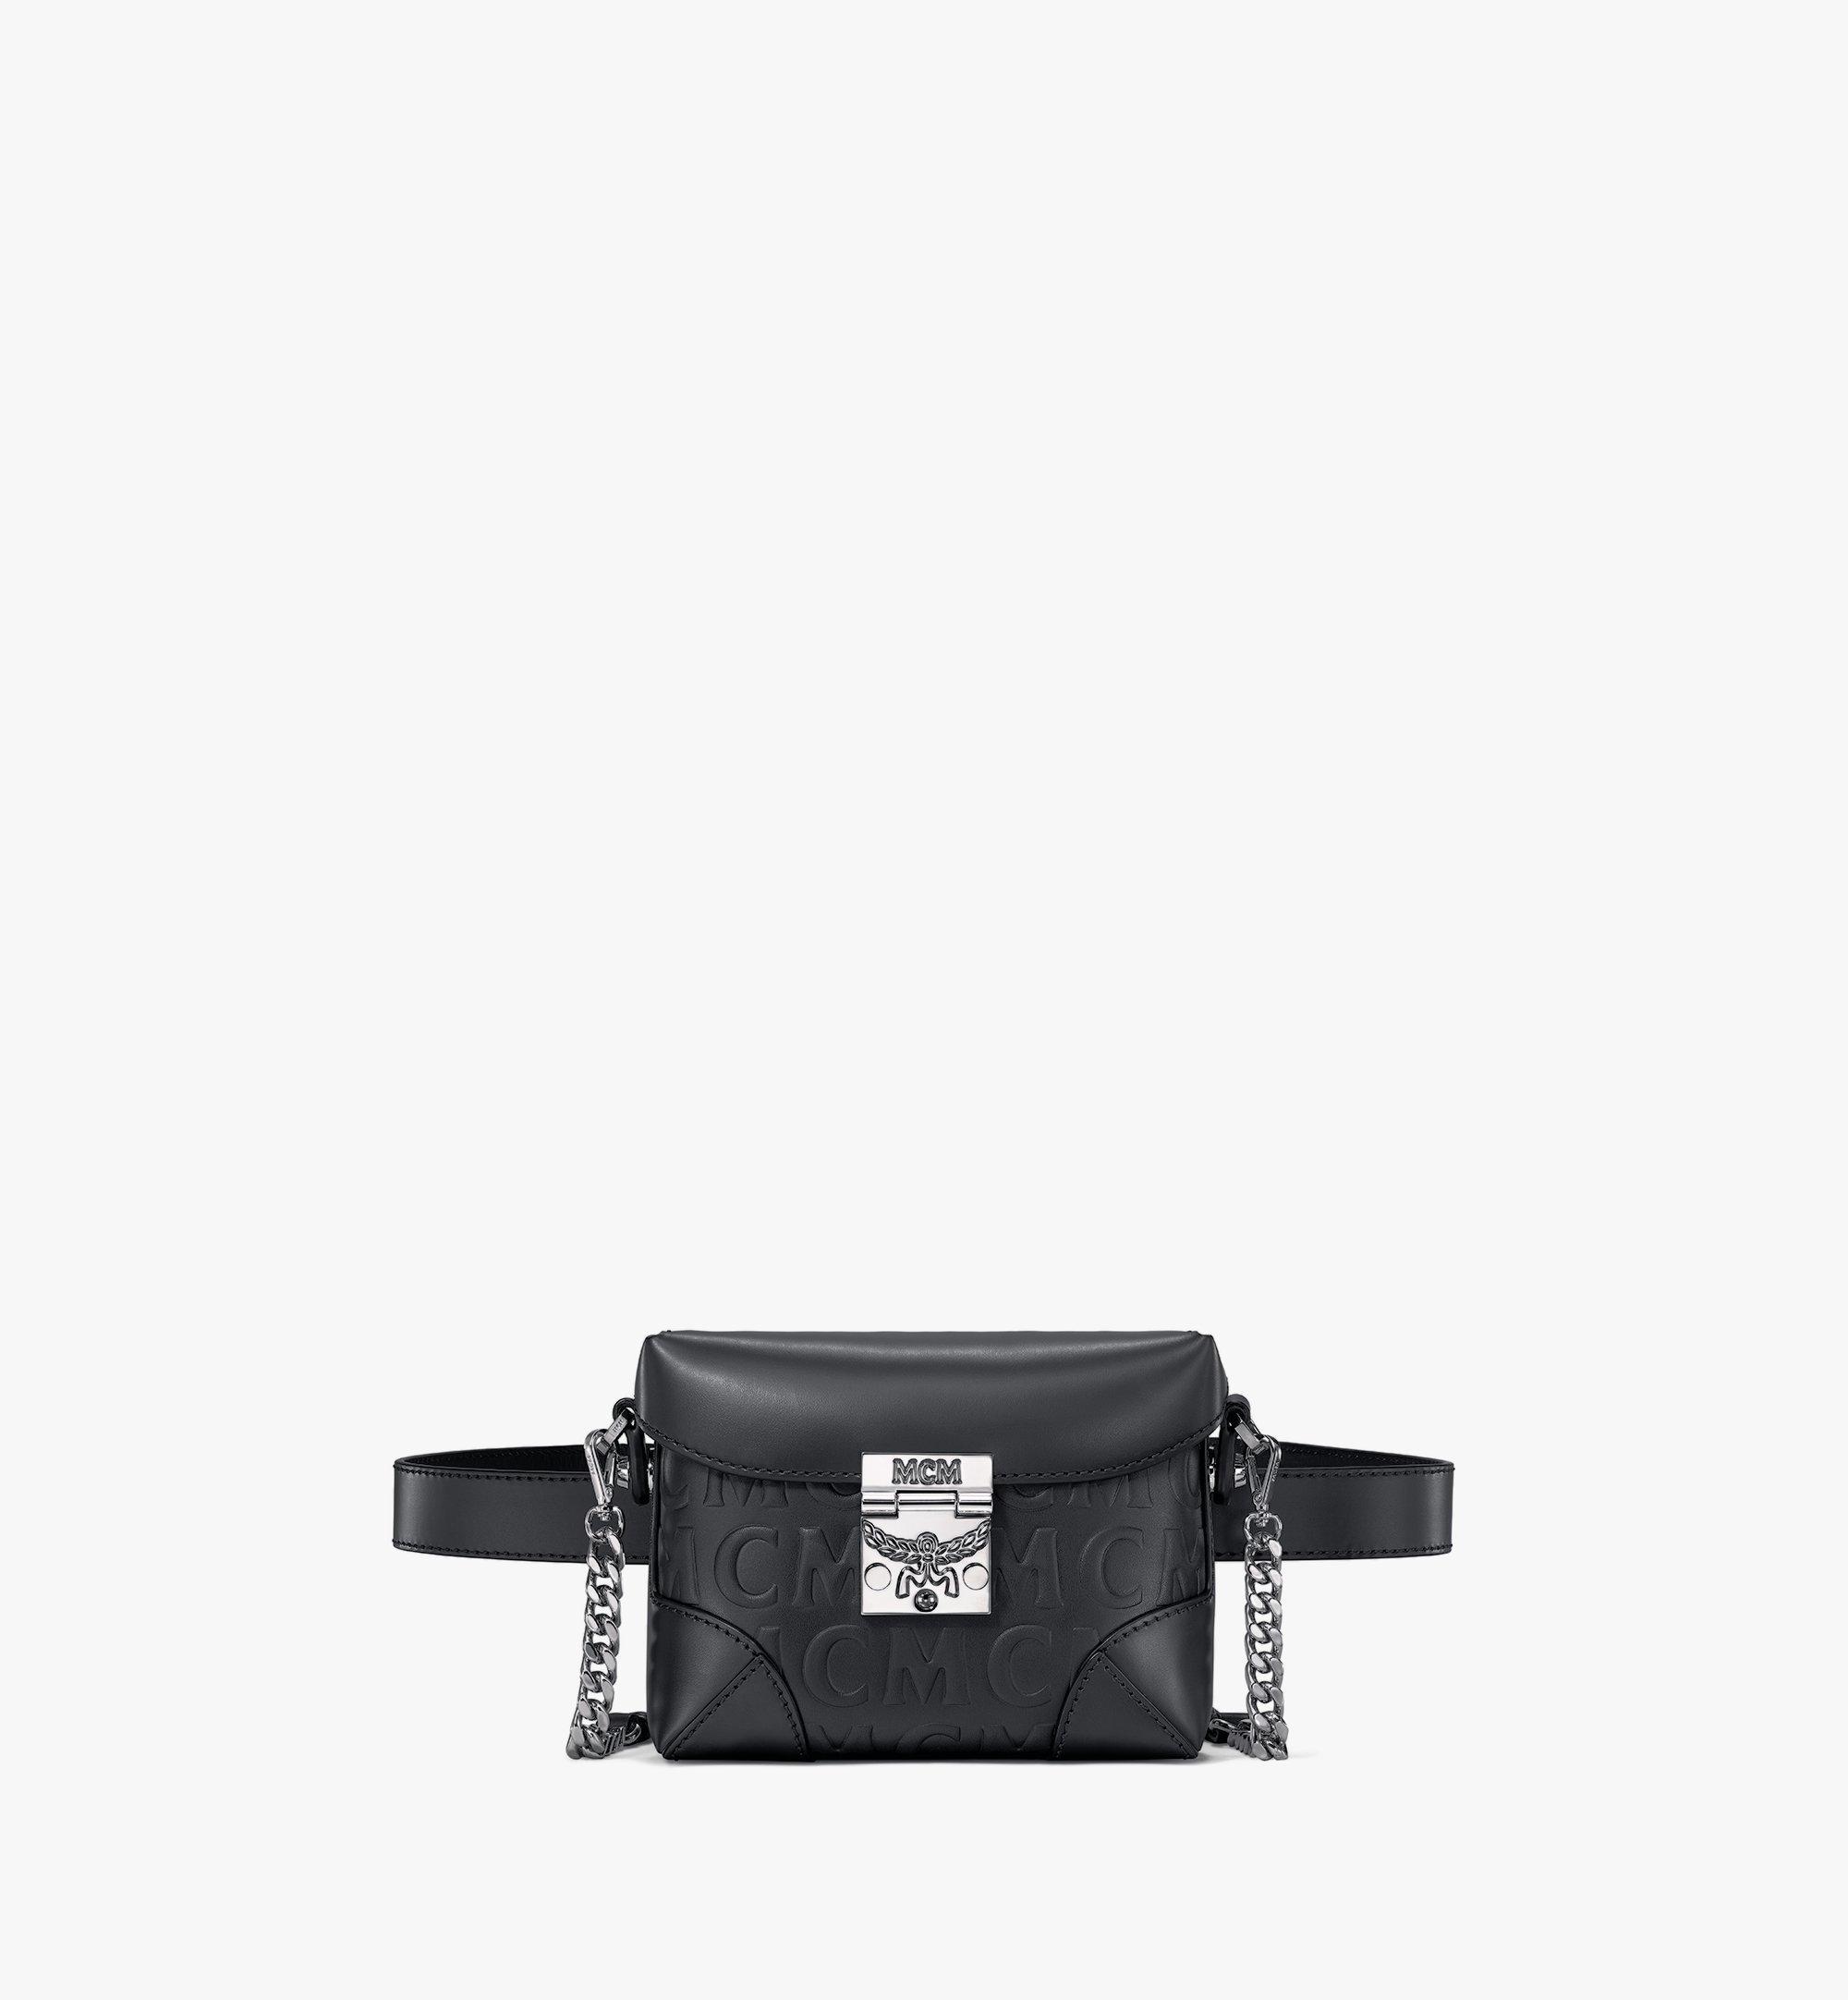 MCM Soft Berlin Belt Bag in MCM Monogram Leather Black MWZAABF01BK001 Alternate View 1